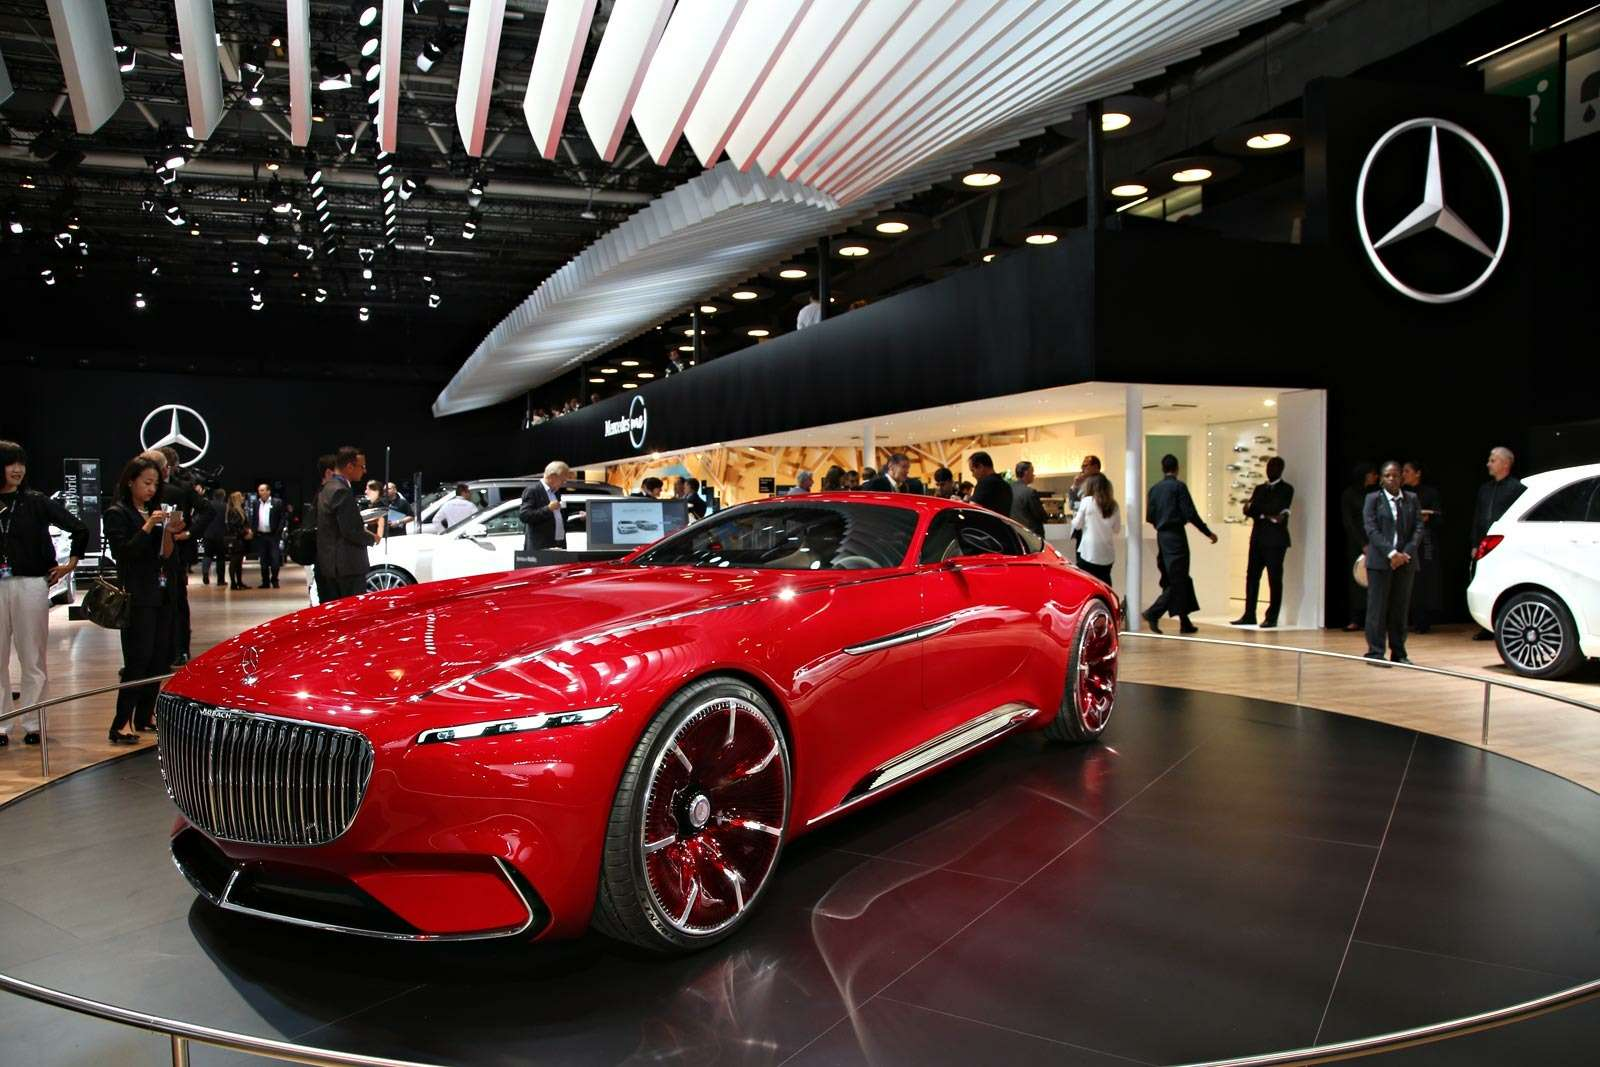 Самый красивый автомобиль Парижа: Vision Mercedes-Maybach 6завоевывает сердца— фото 643578